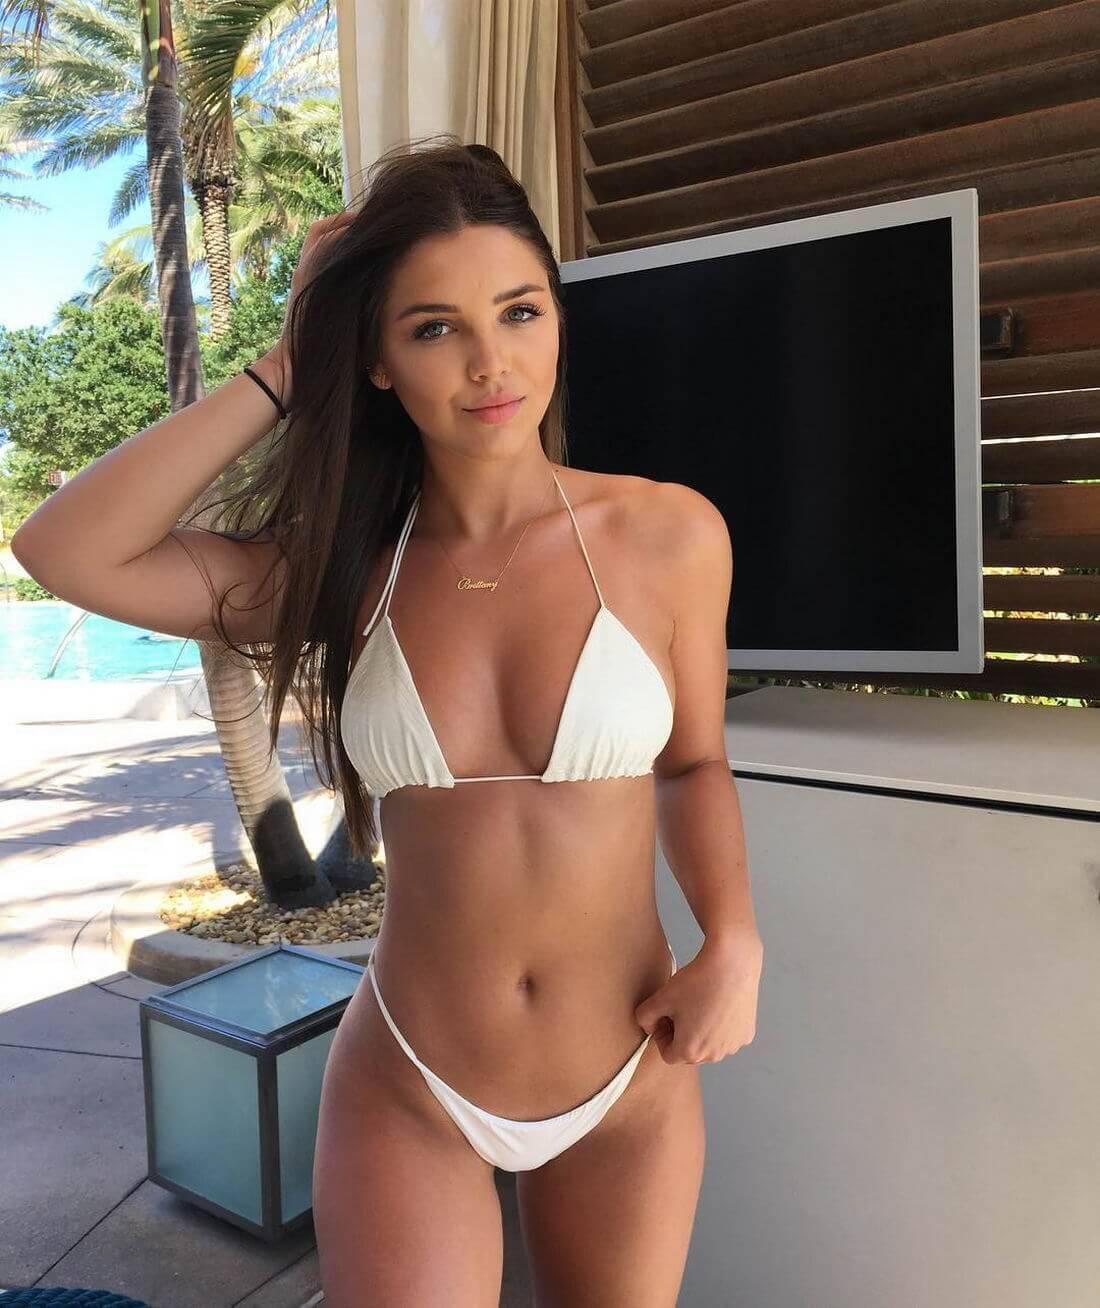 Ana Lucia Dominguez En Tanga fotos de mujeres en bikini - donvago